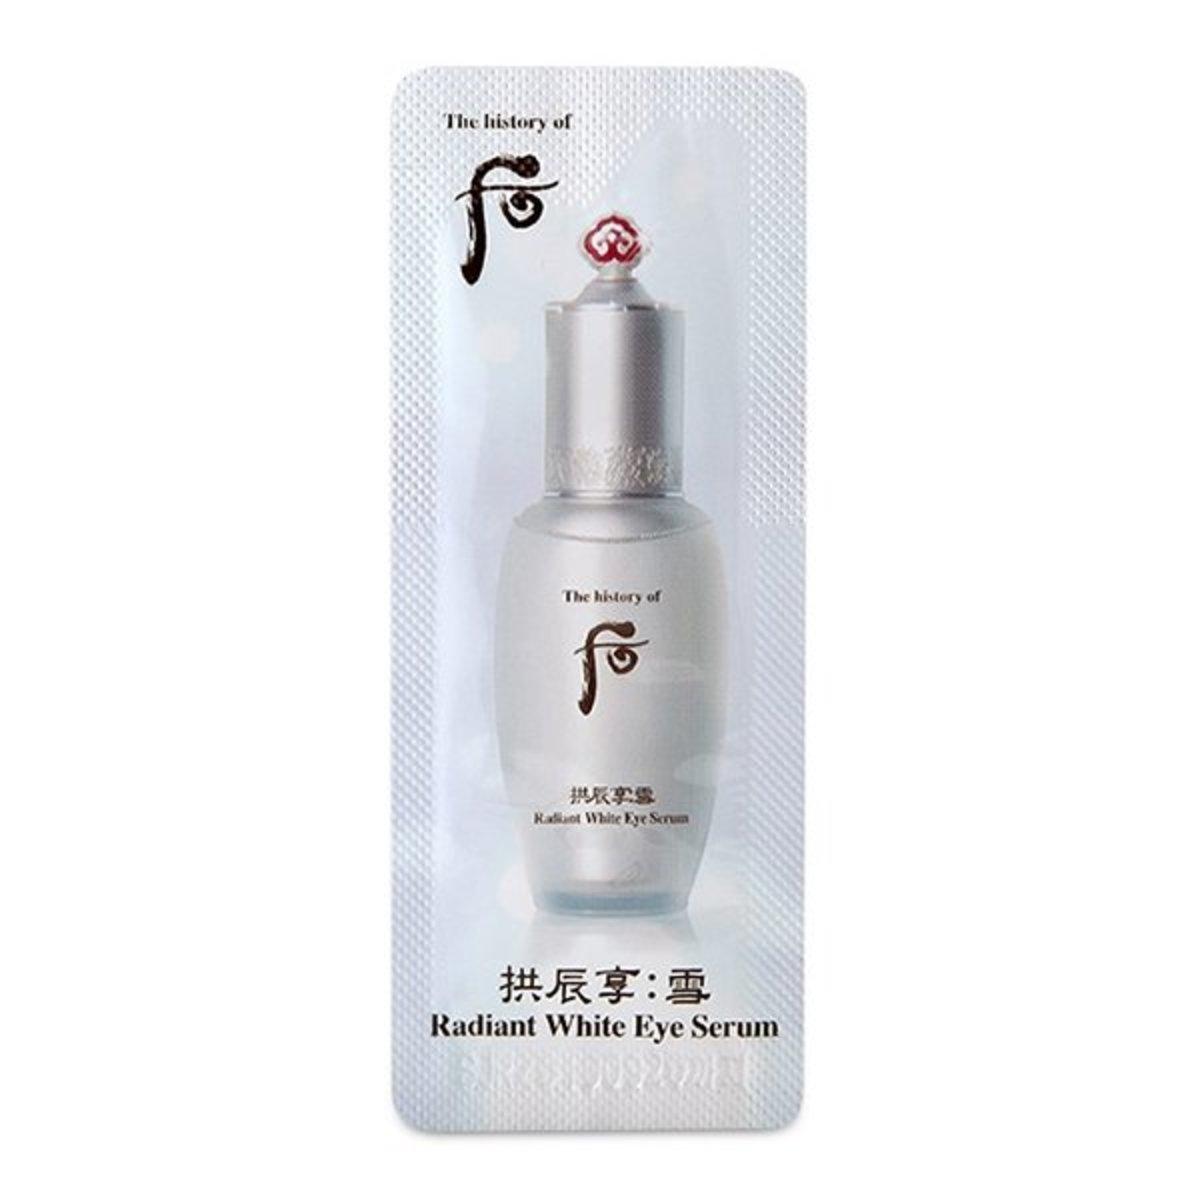 Radiant White Eye Serum Pouch 10pcs